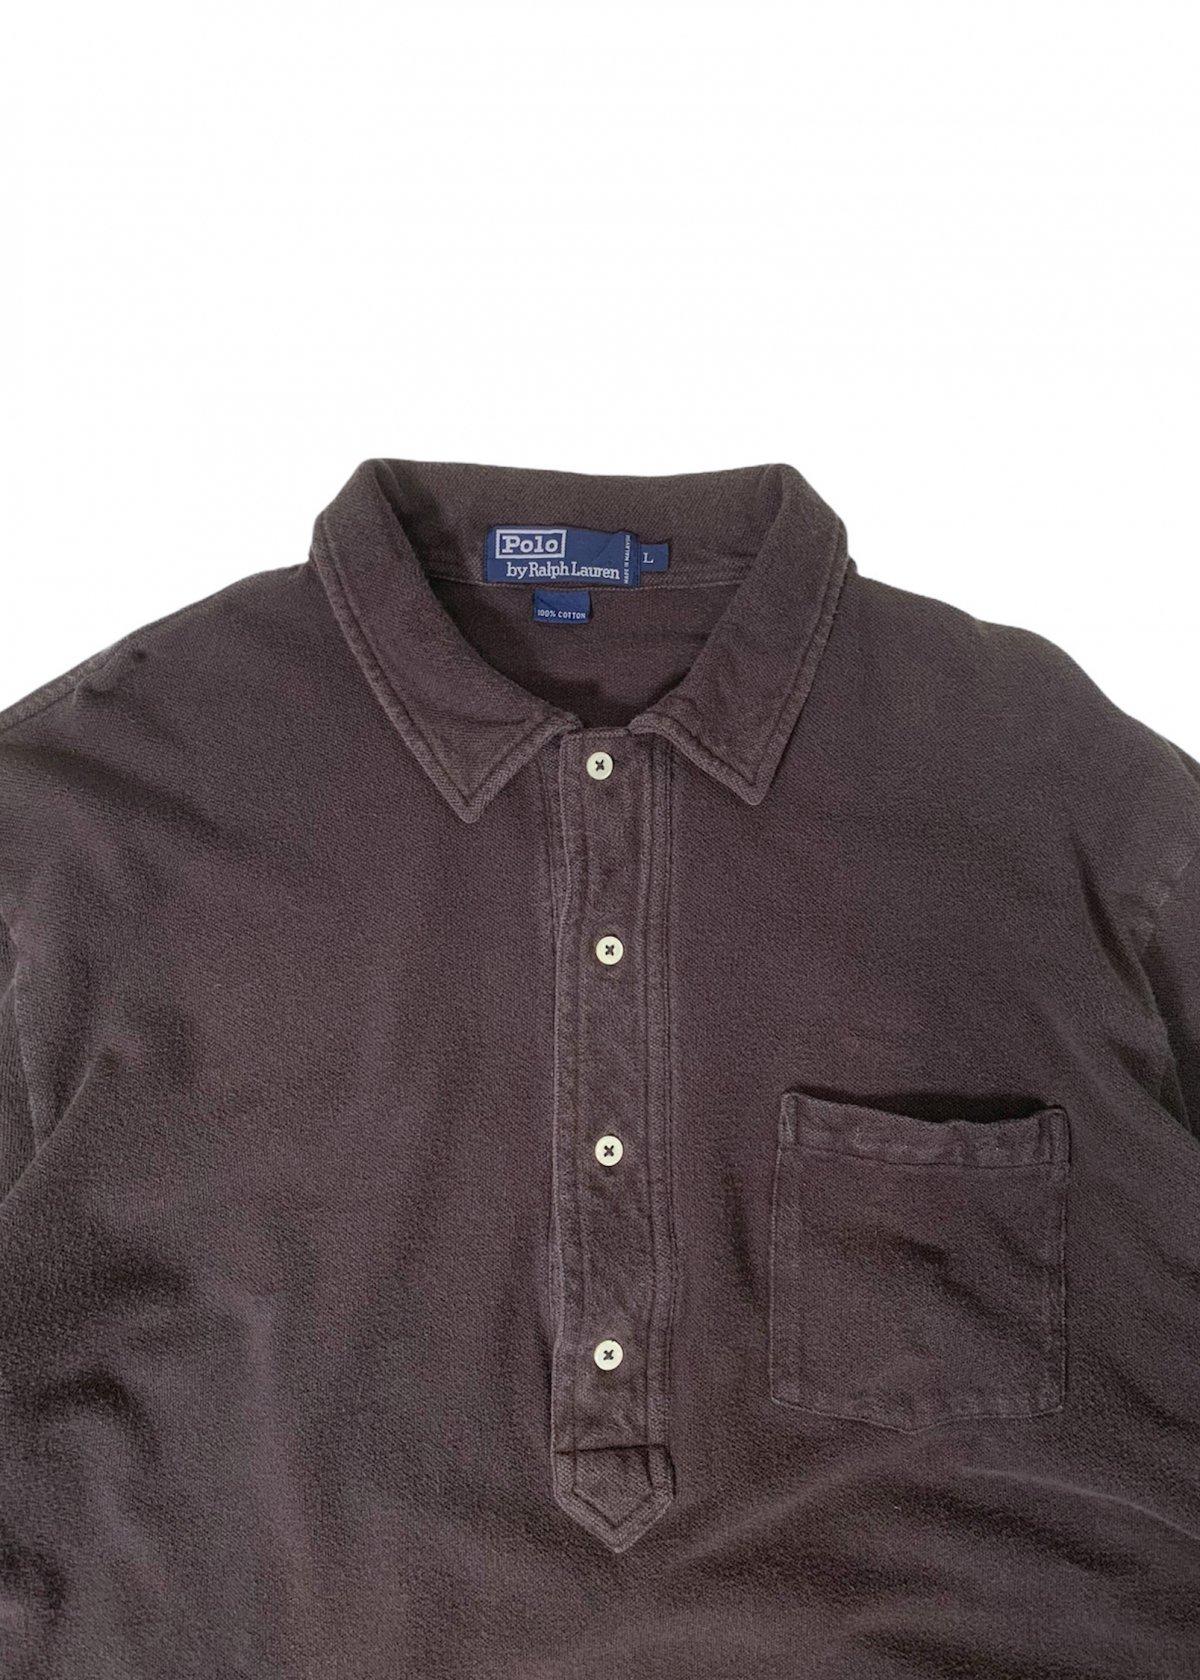 "I&I 古着 通販 ""Polo Ralph Lauren"" L/S Polo Shirt 詳細画像3"